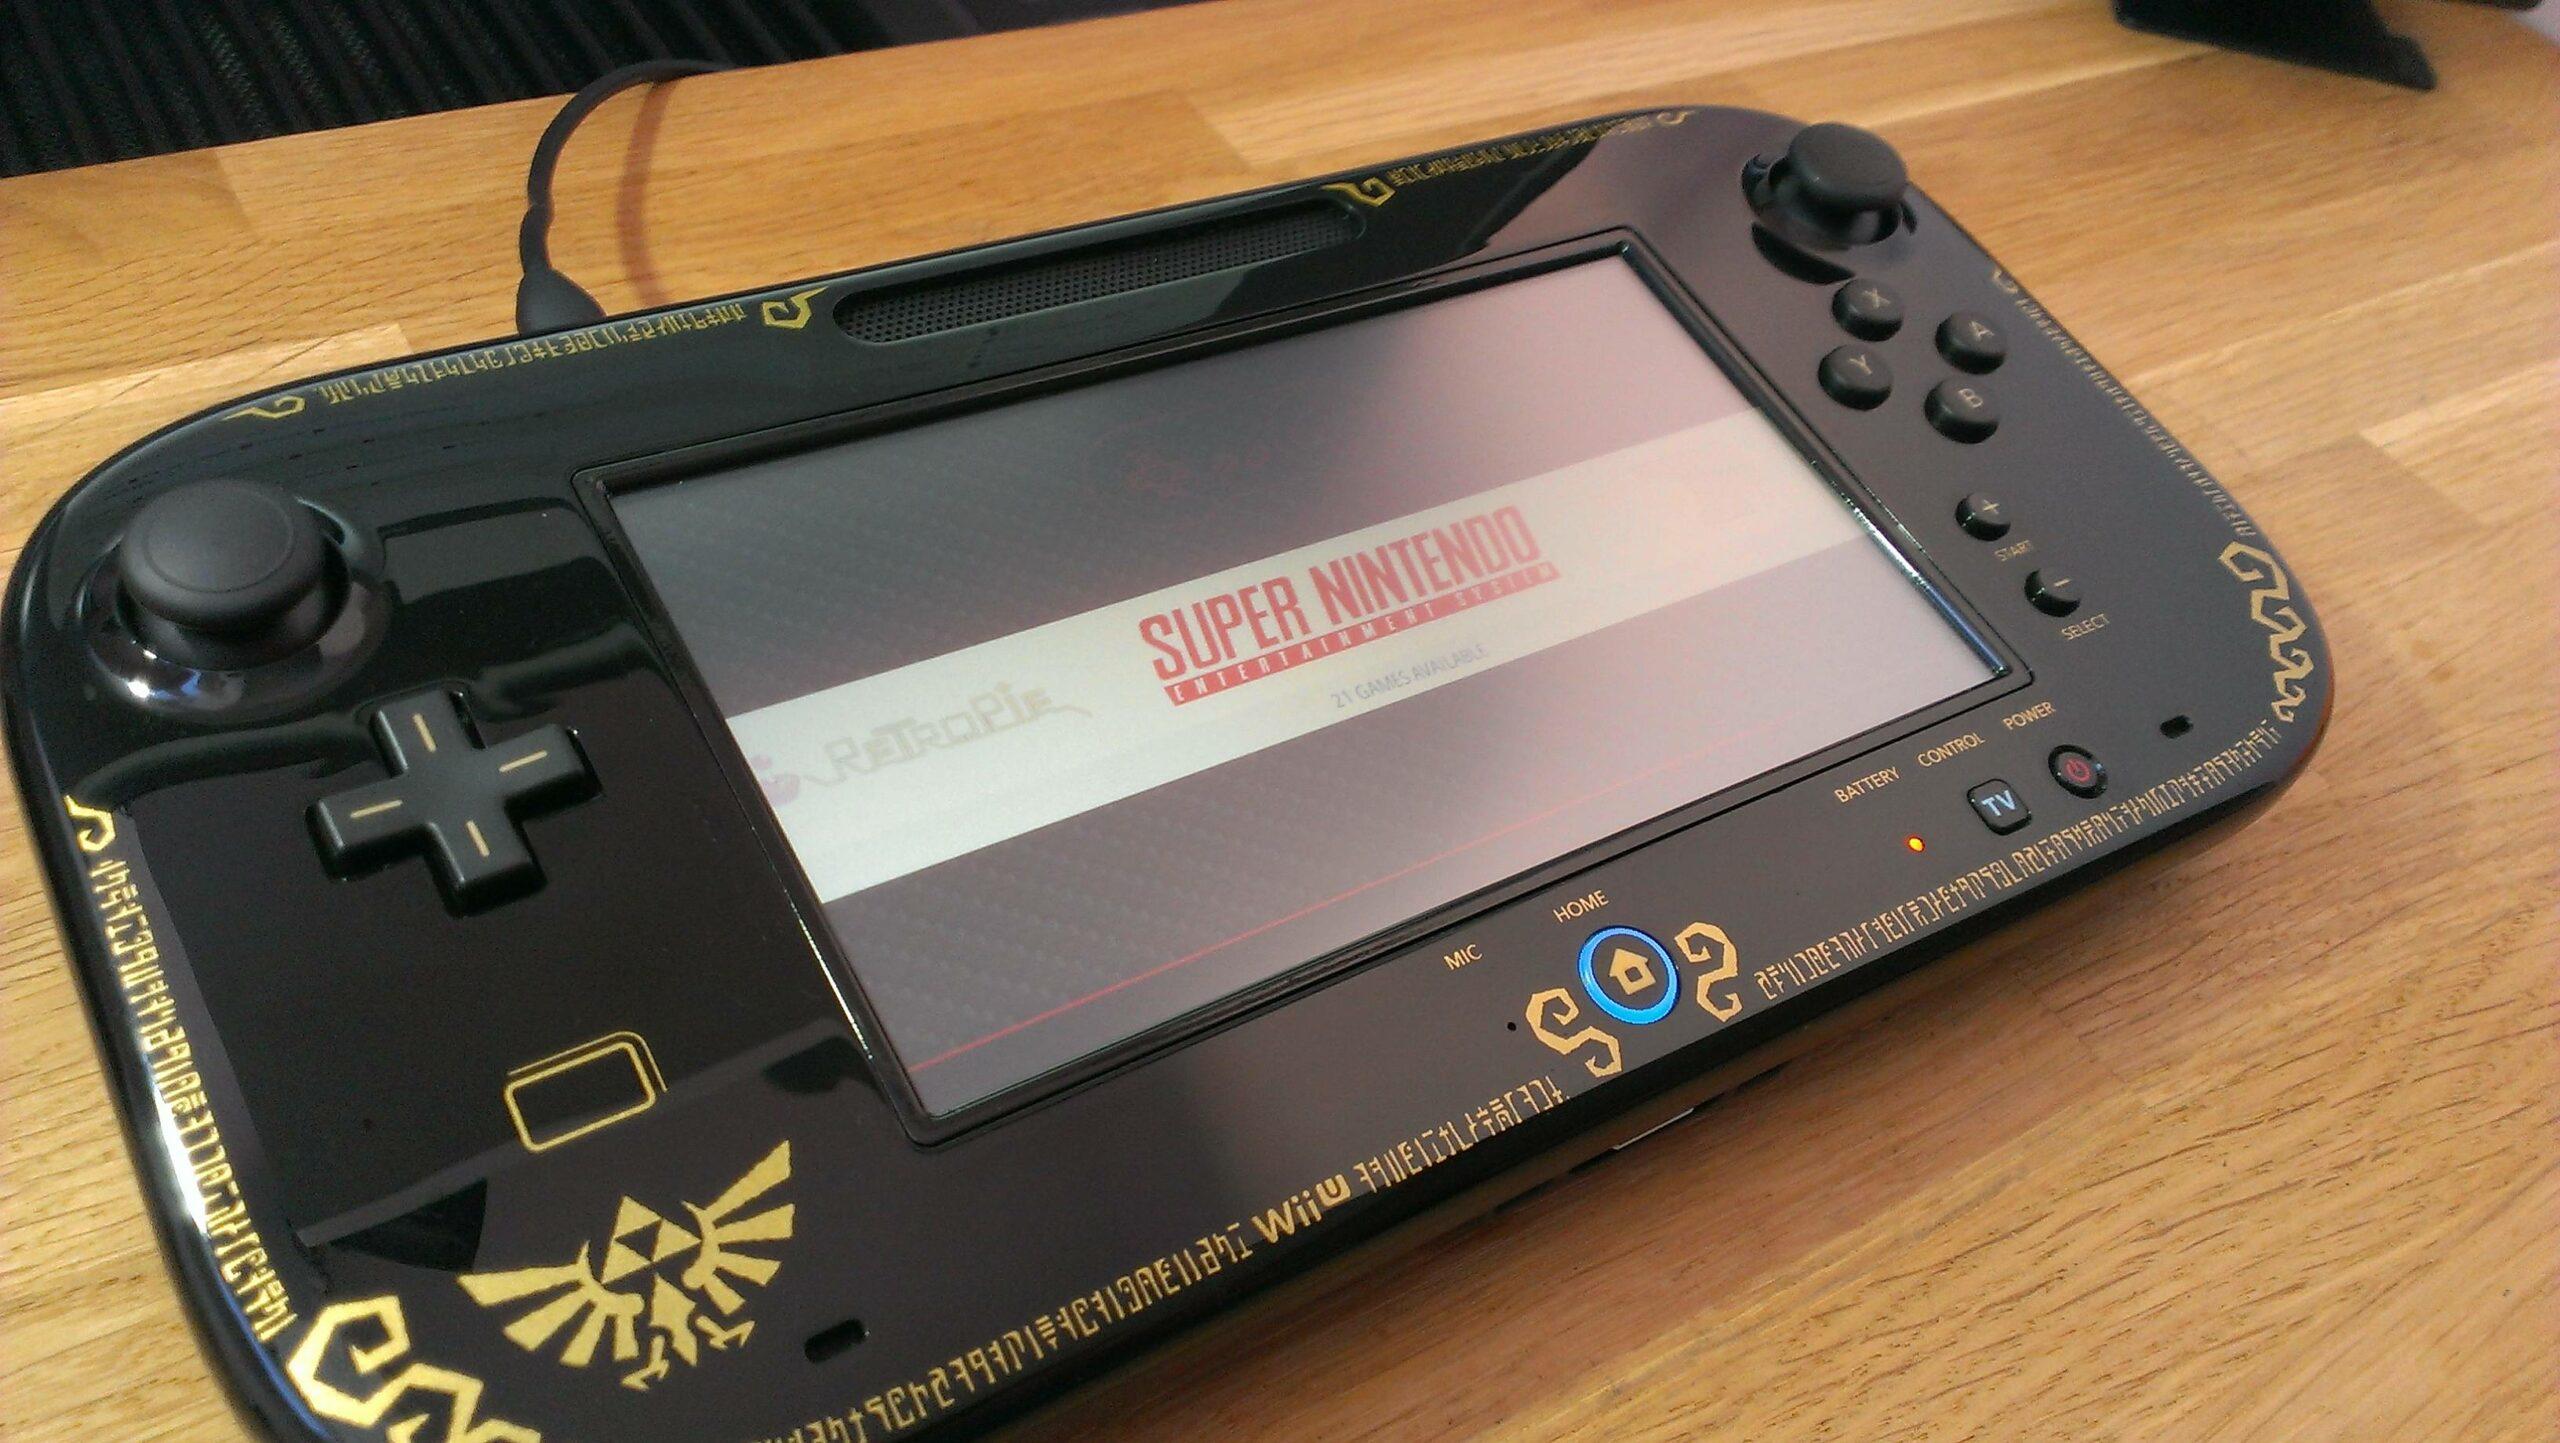 Nintendo Wii U Controller In Eigenst Ndige Handheld